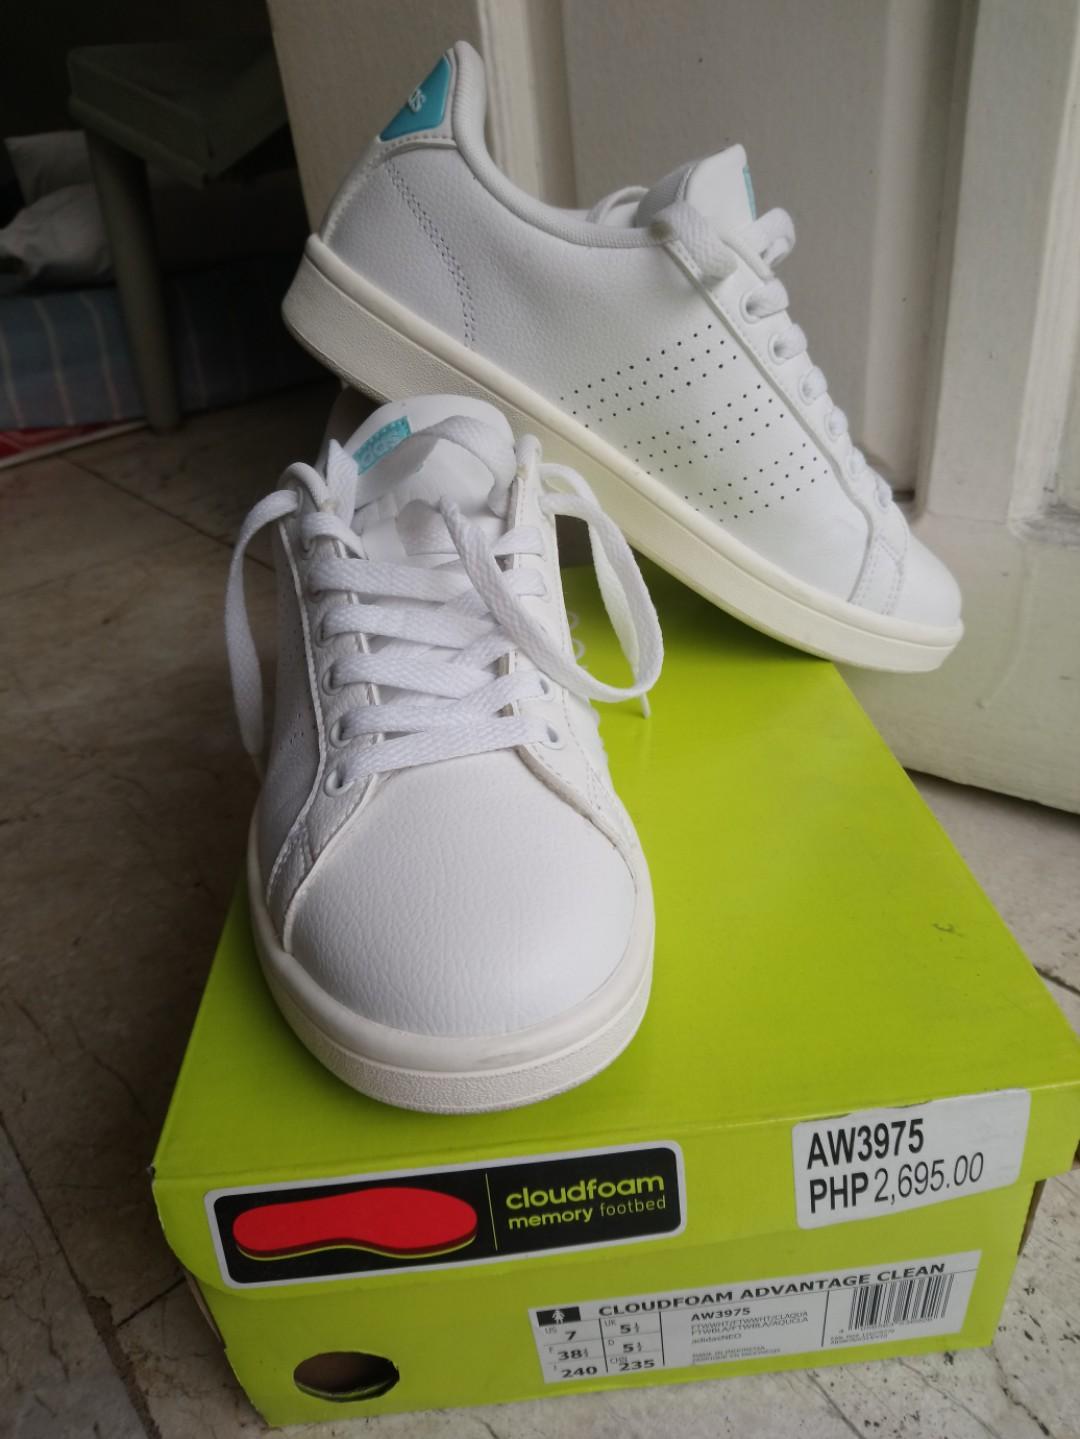 White Adidas Neo Shoes (cloudfoam